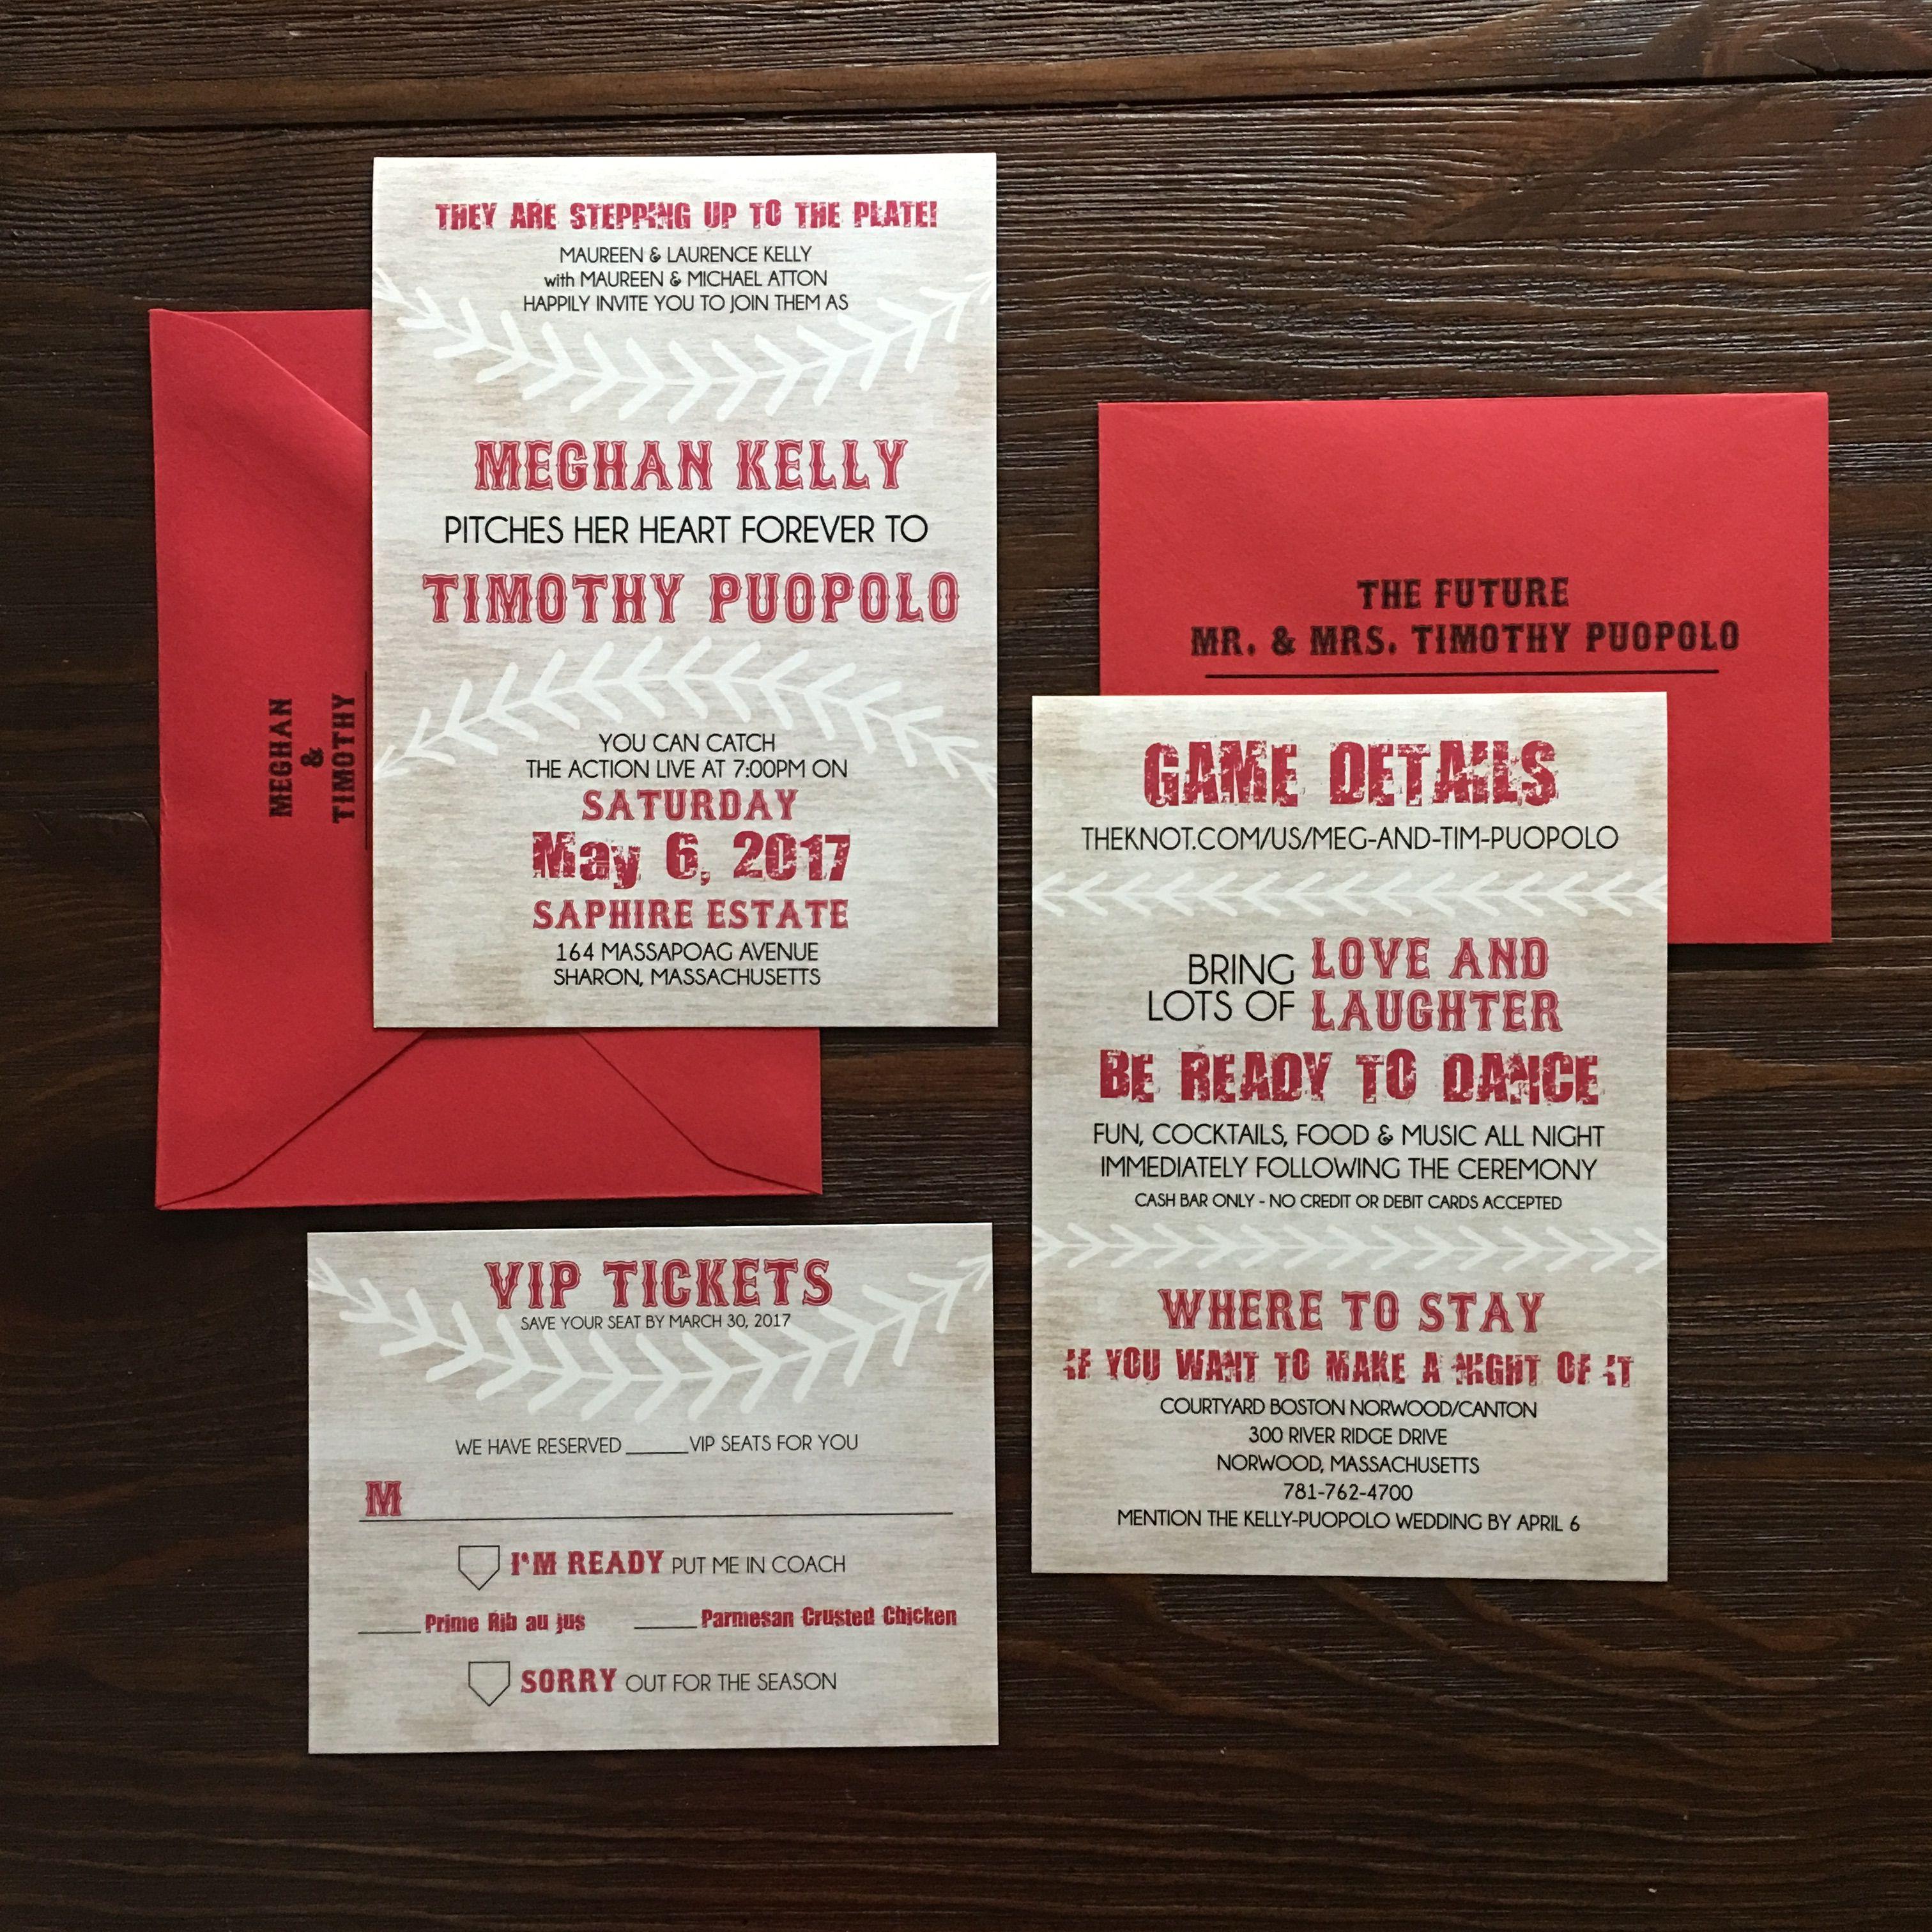 Baseball wedding invitations | Invitations by Tag Design | Pinterest ...